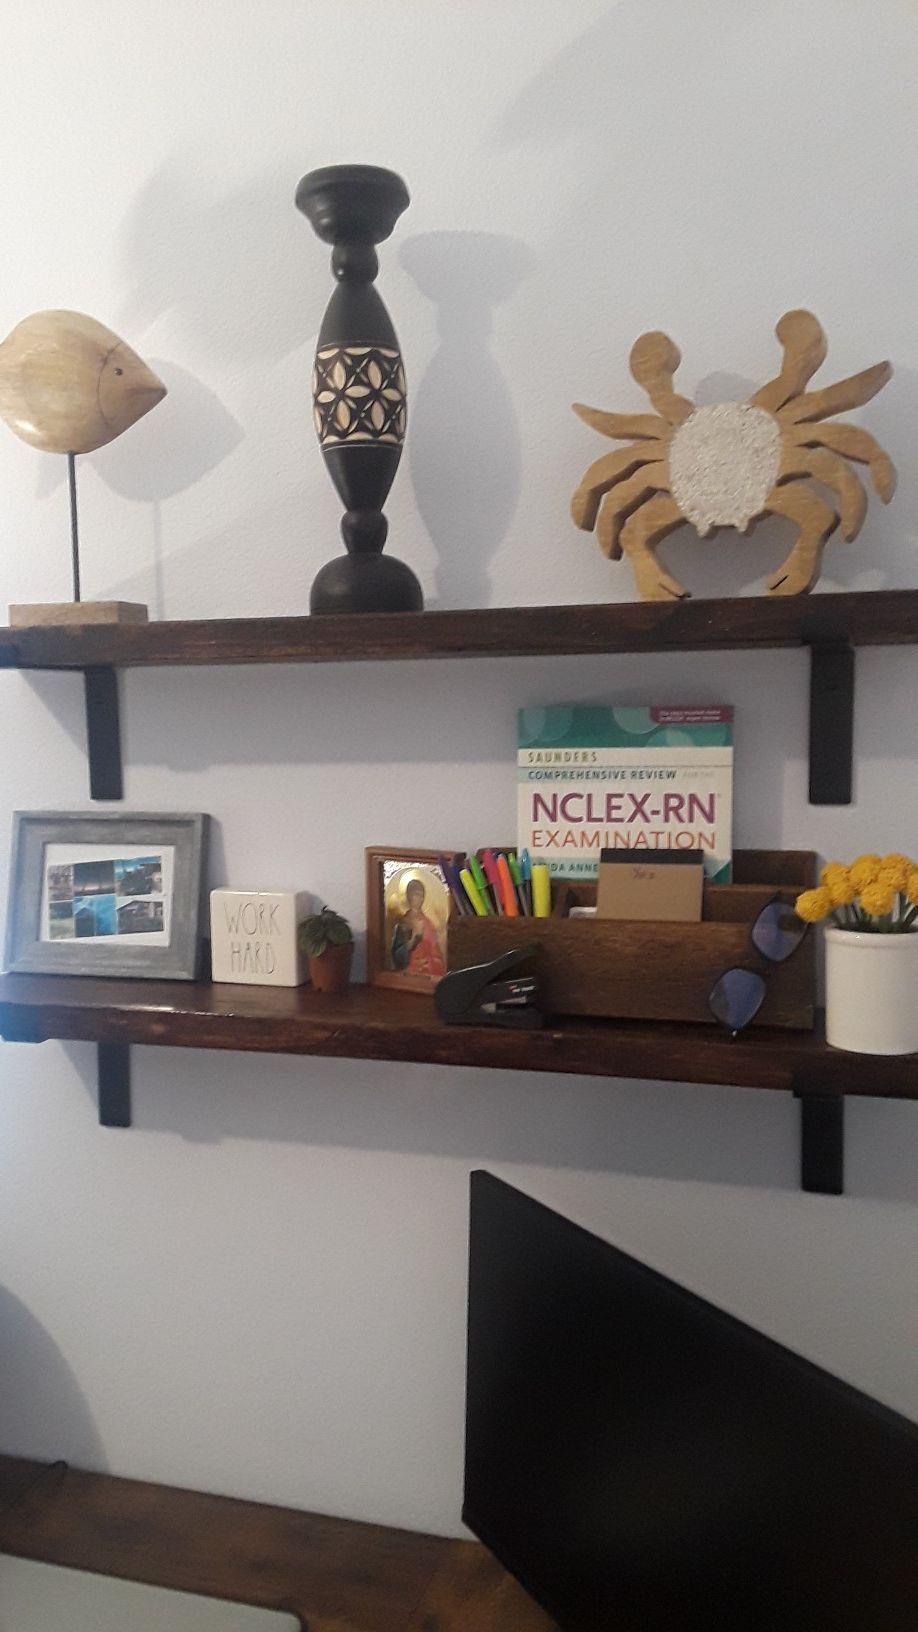 Wood decorative shelves